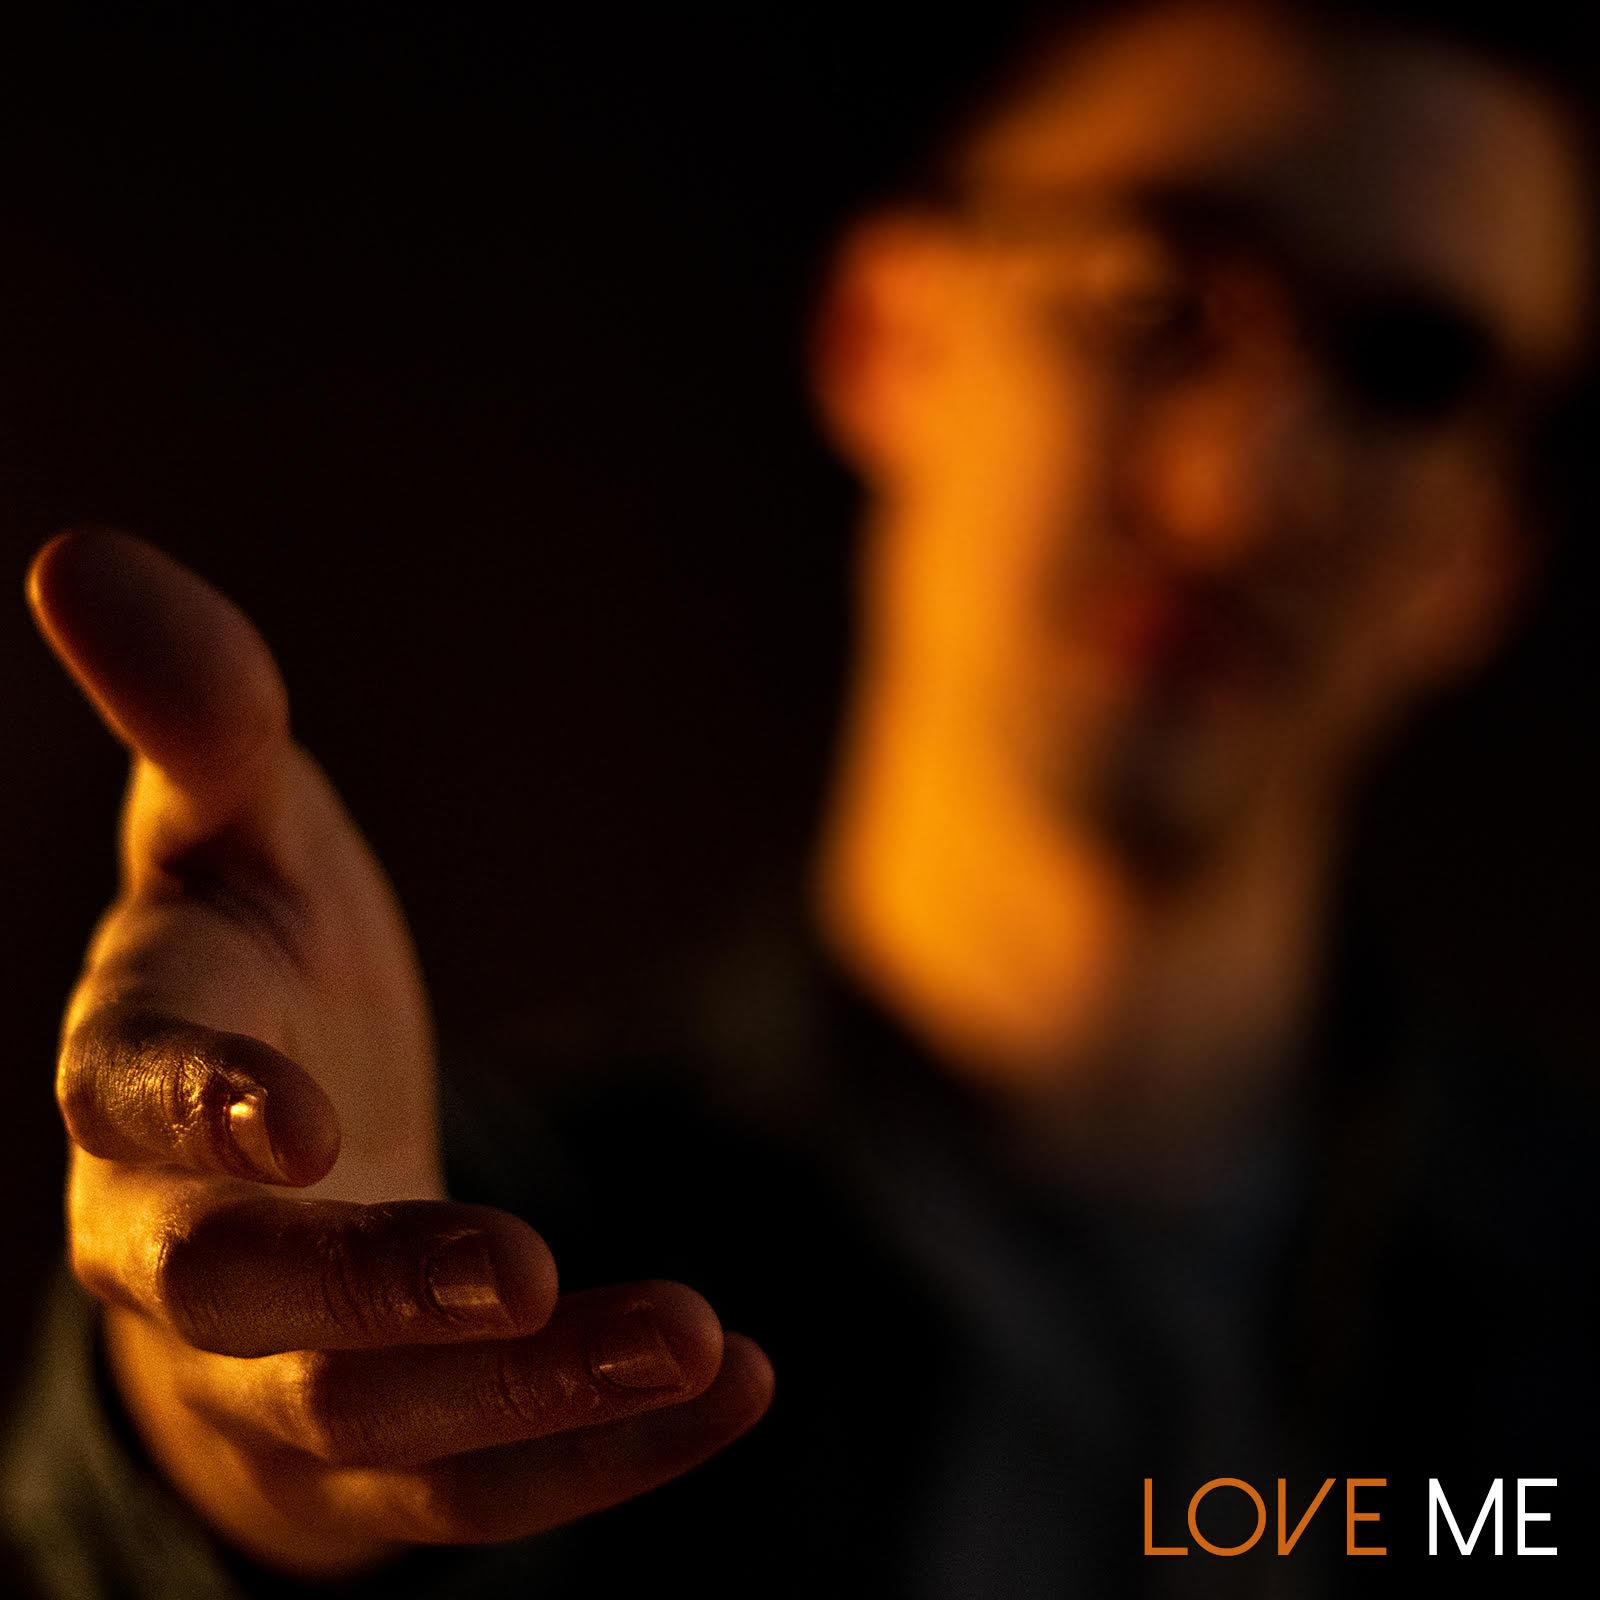 Cayman Wendt- Love Me